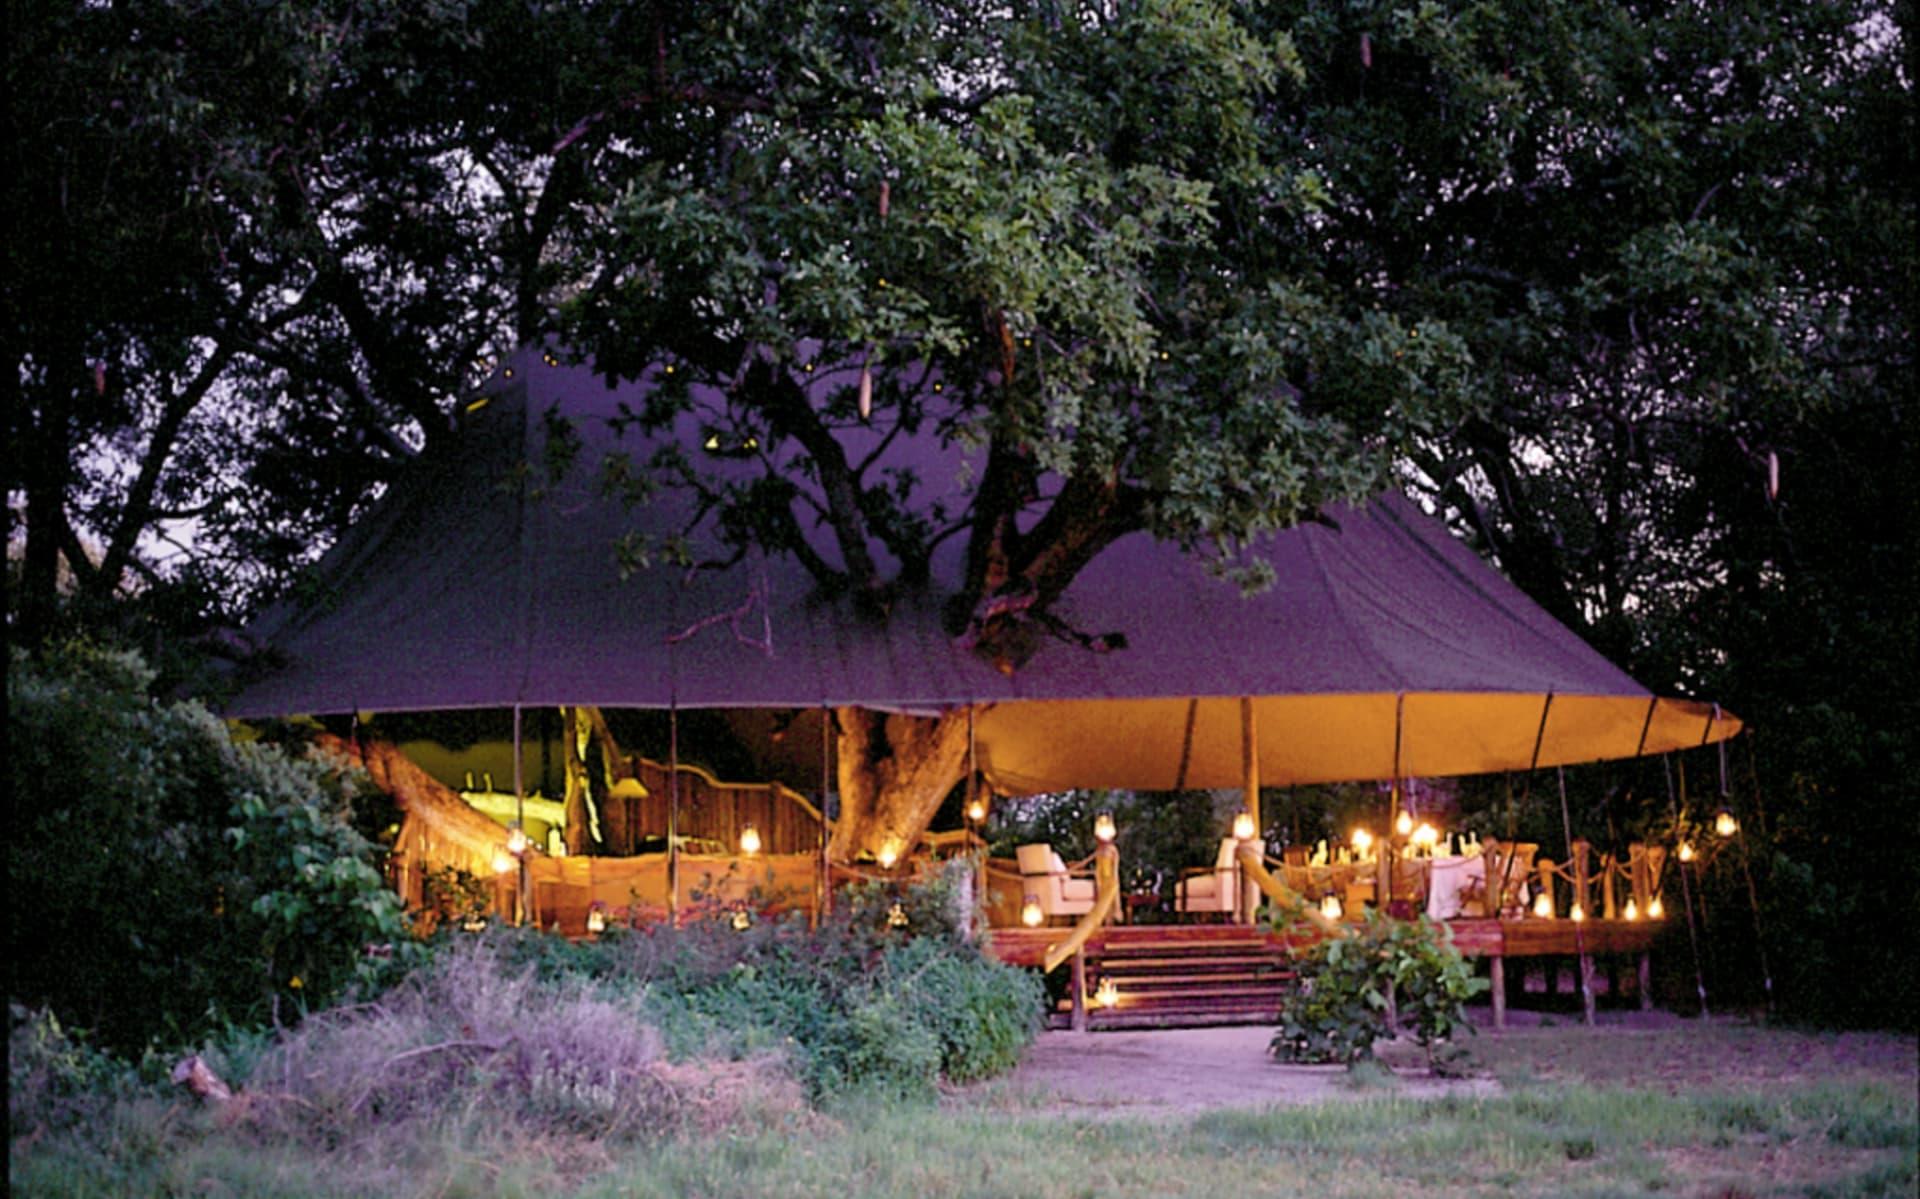 Sanctuary Stanley's Camp in Okavango Delta: Stanley's at night 1a